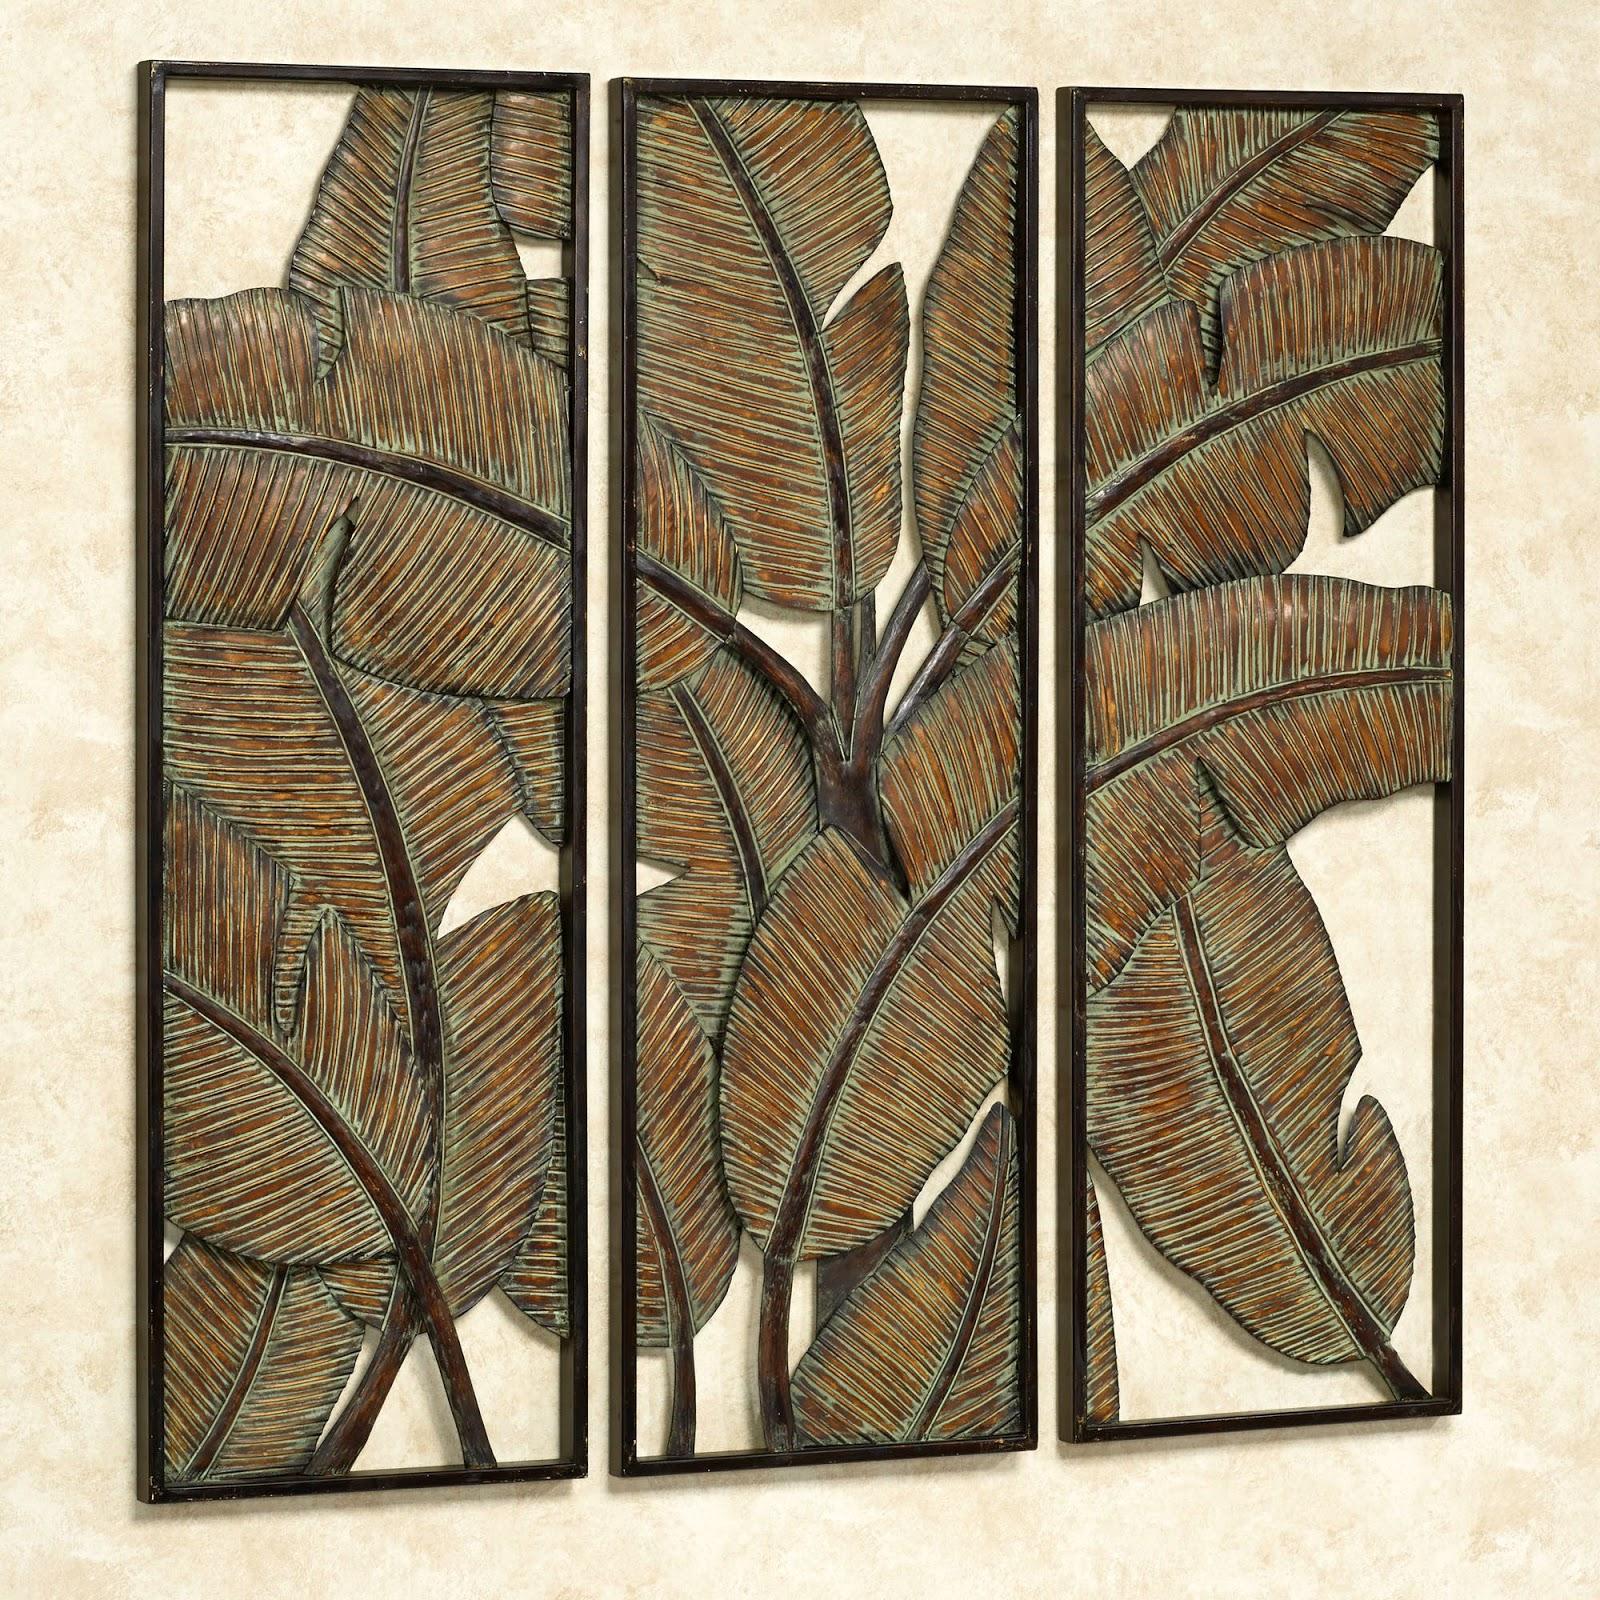 metal wall art art projects art ideas. Black Bedroom Furniture Sets. Home Design Ideas